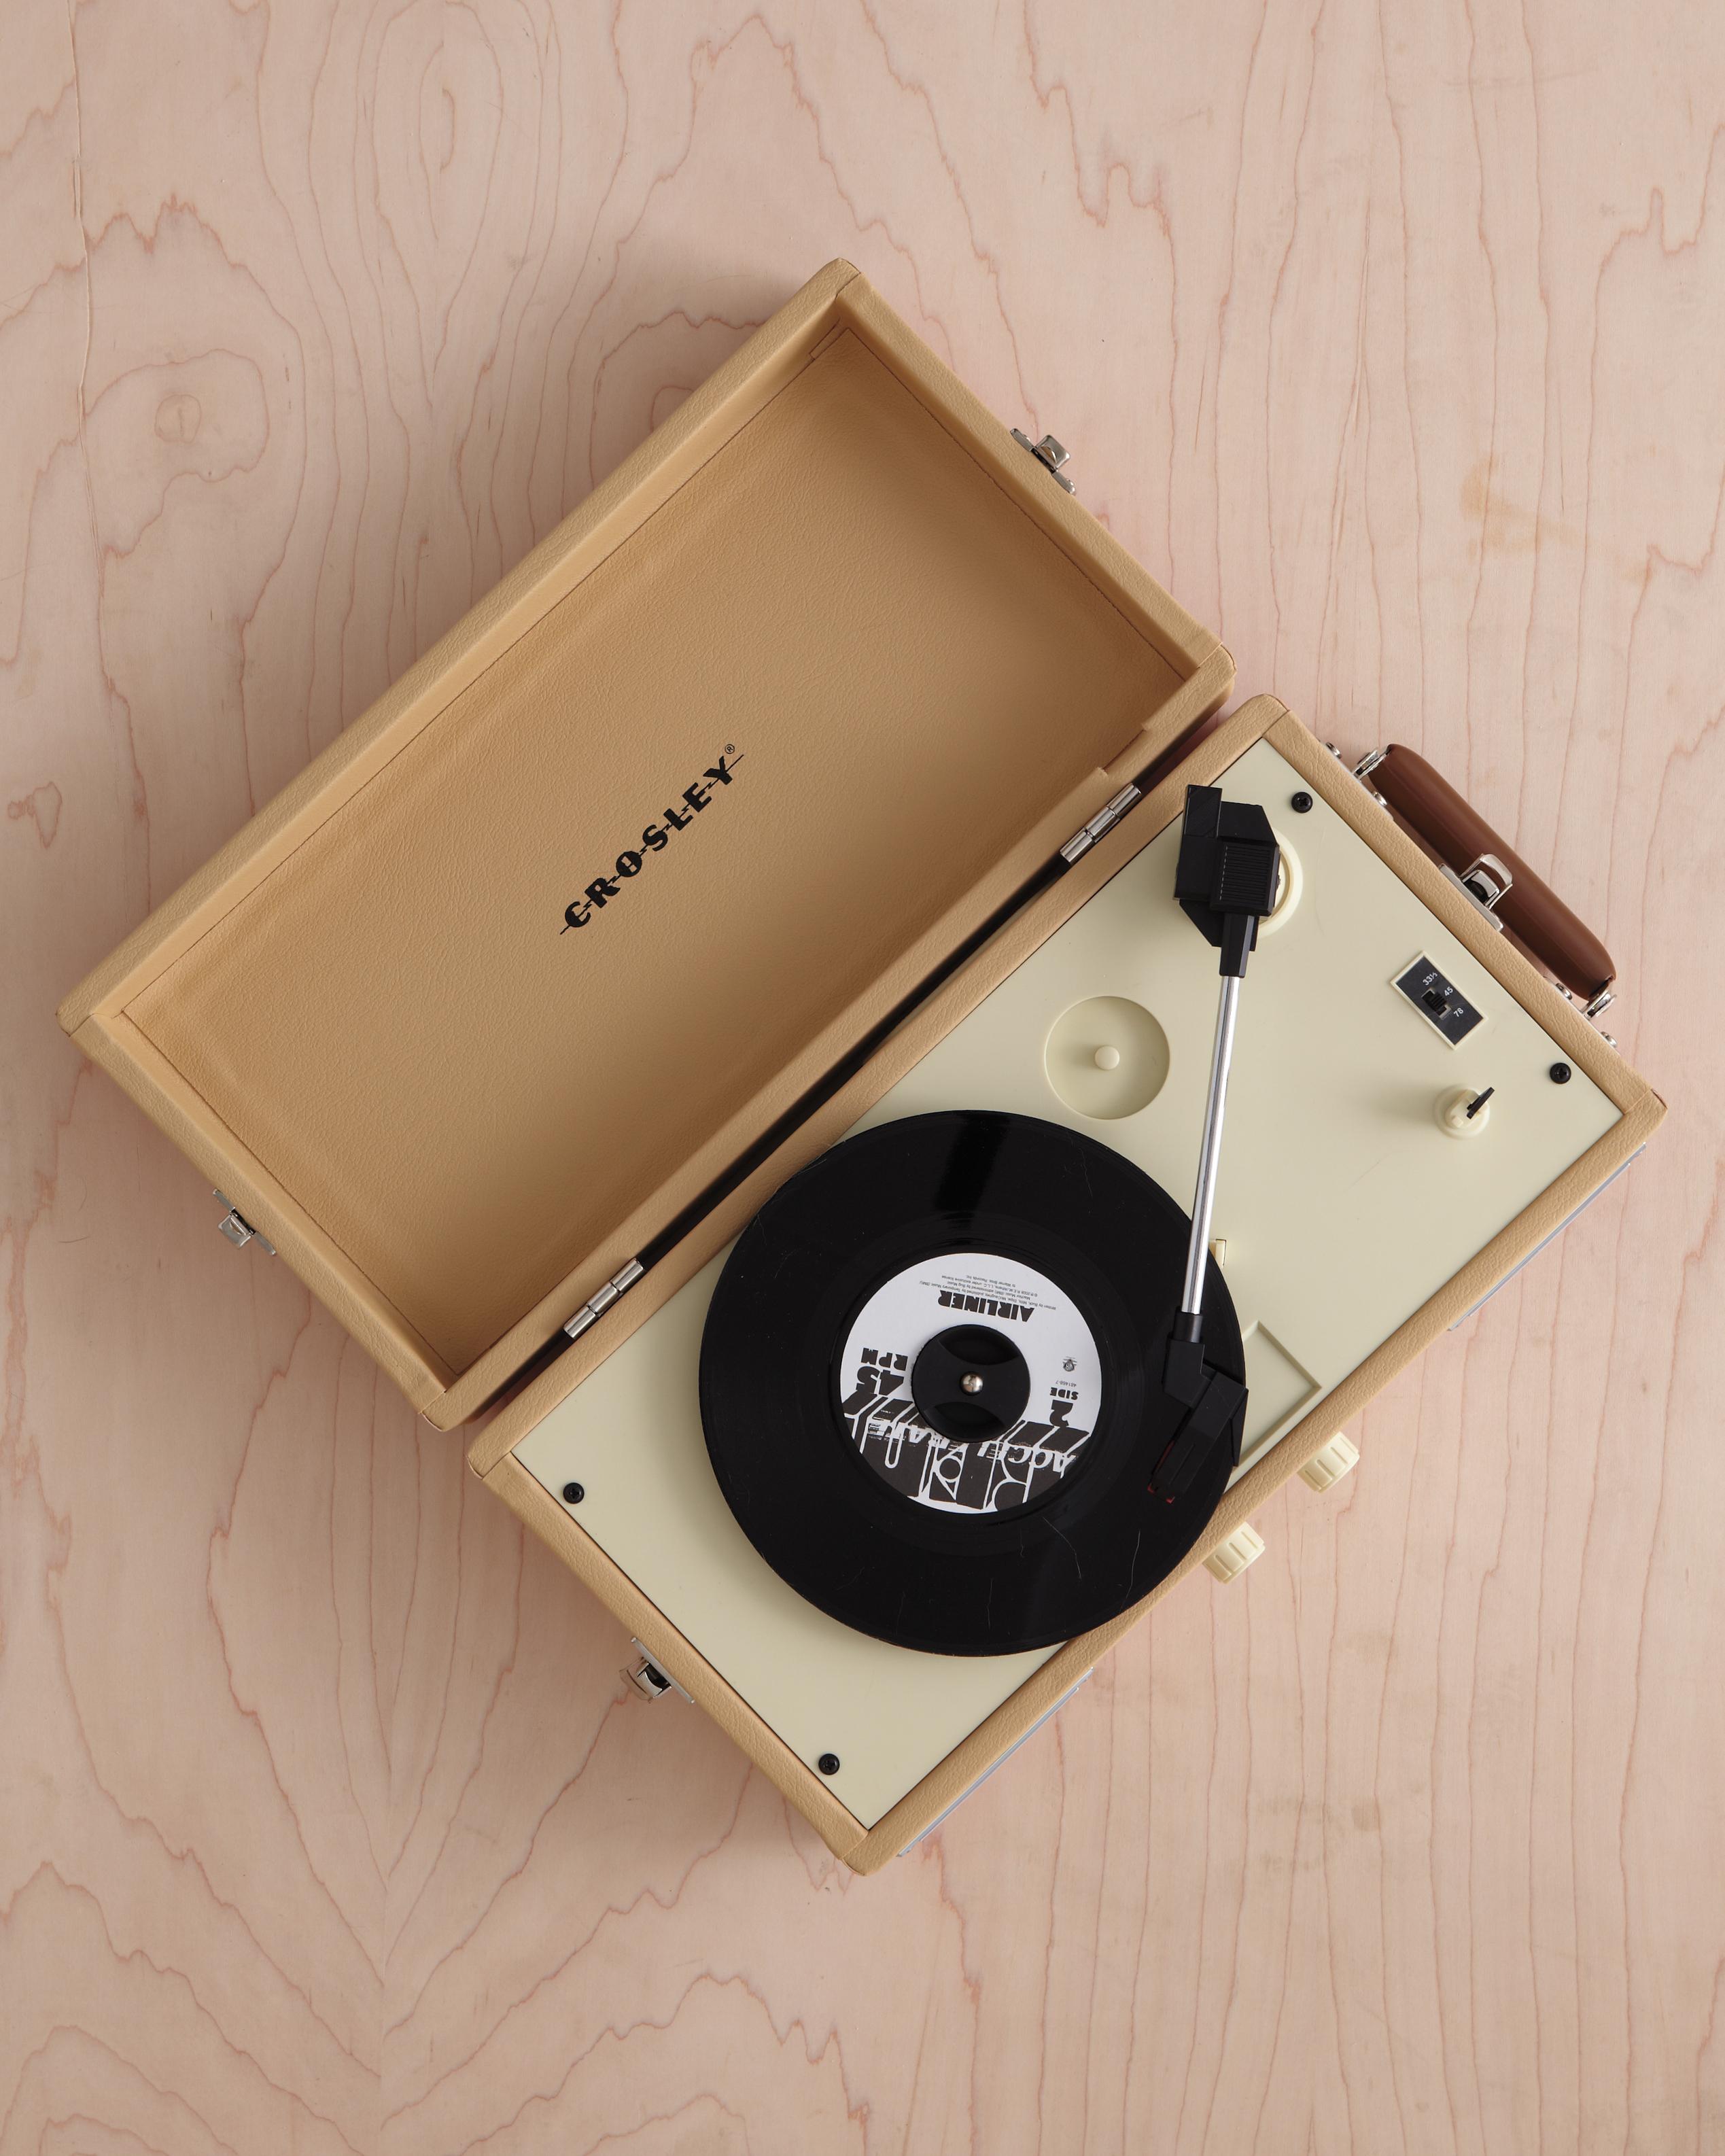 record-player-068-mwd109796.jpg